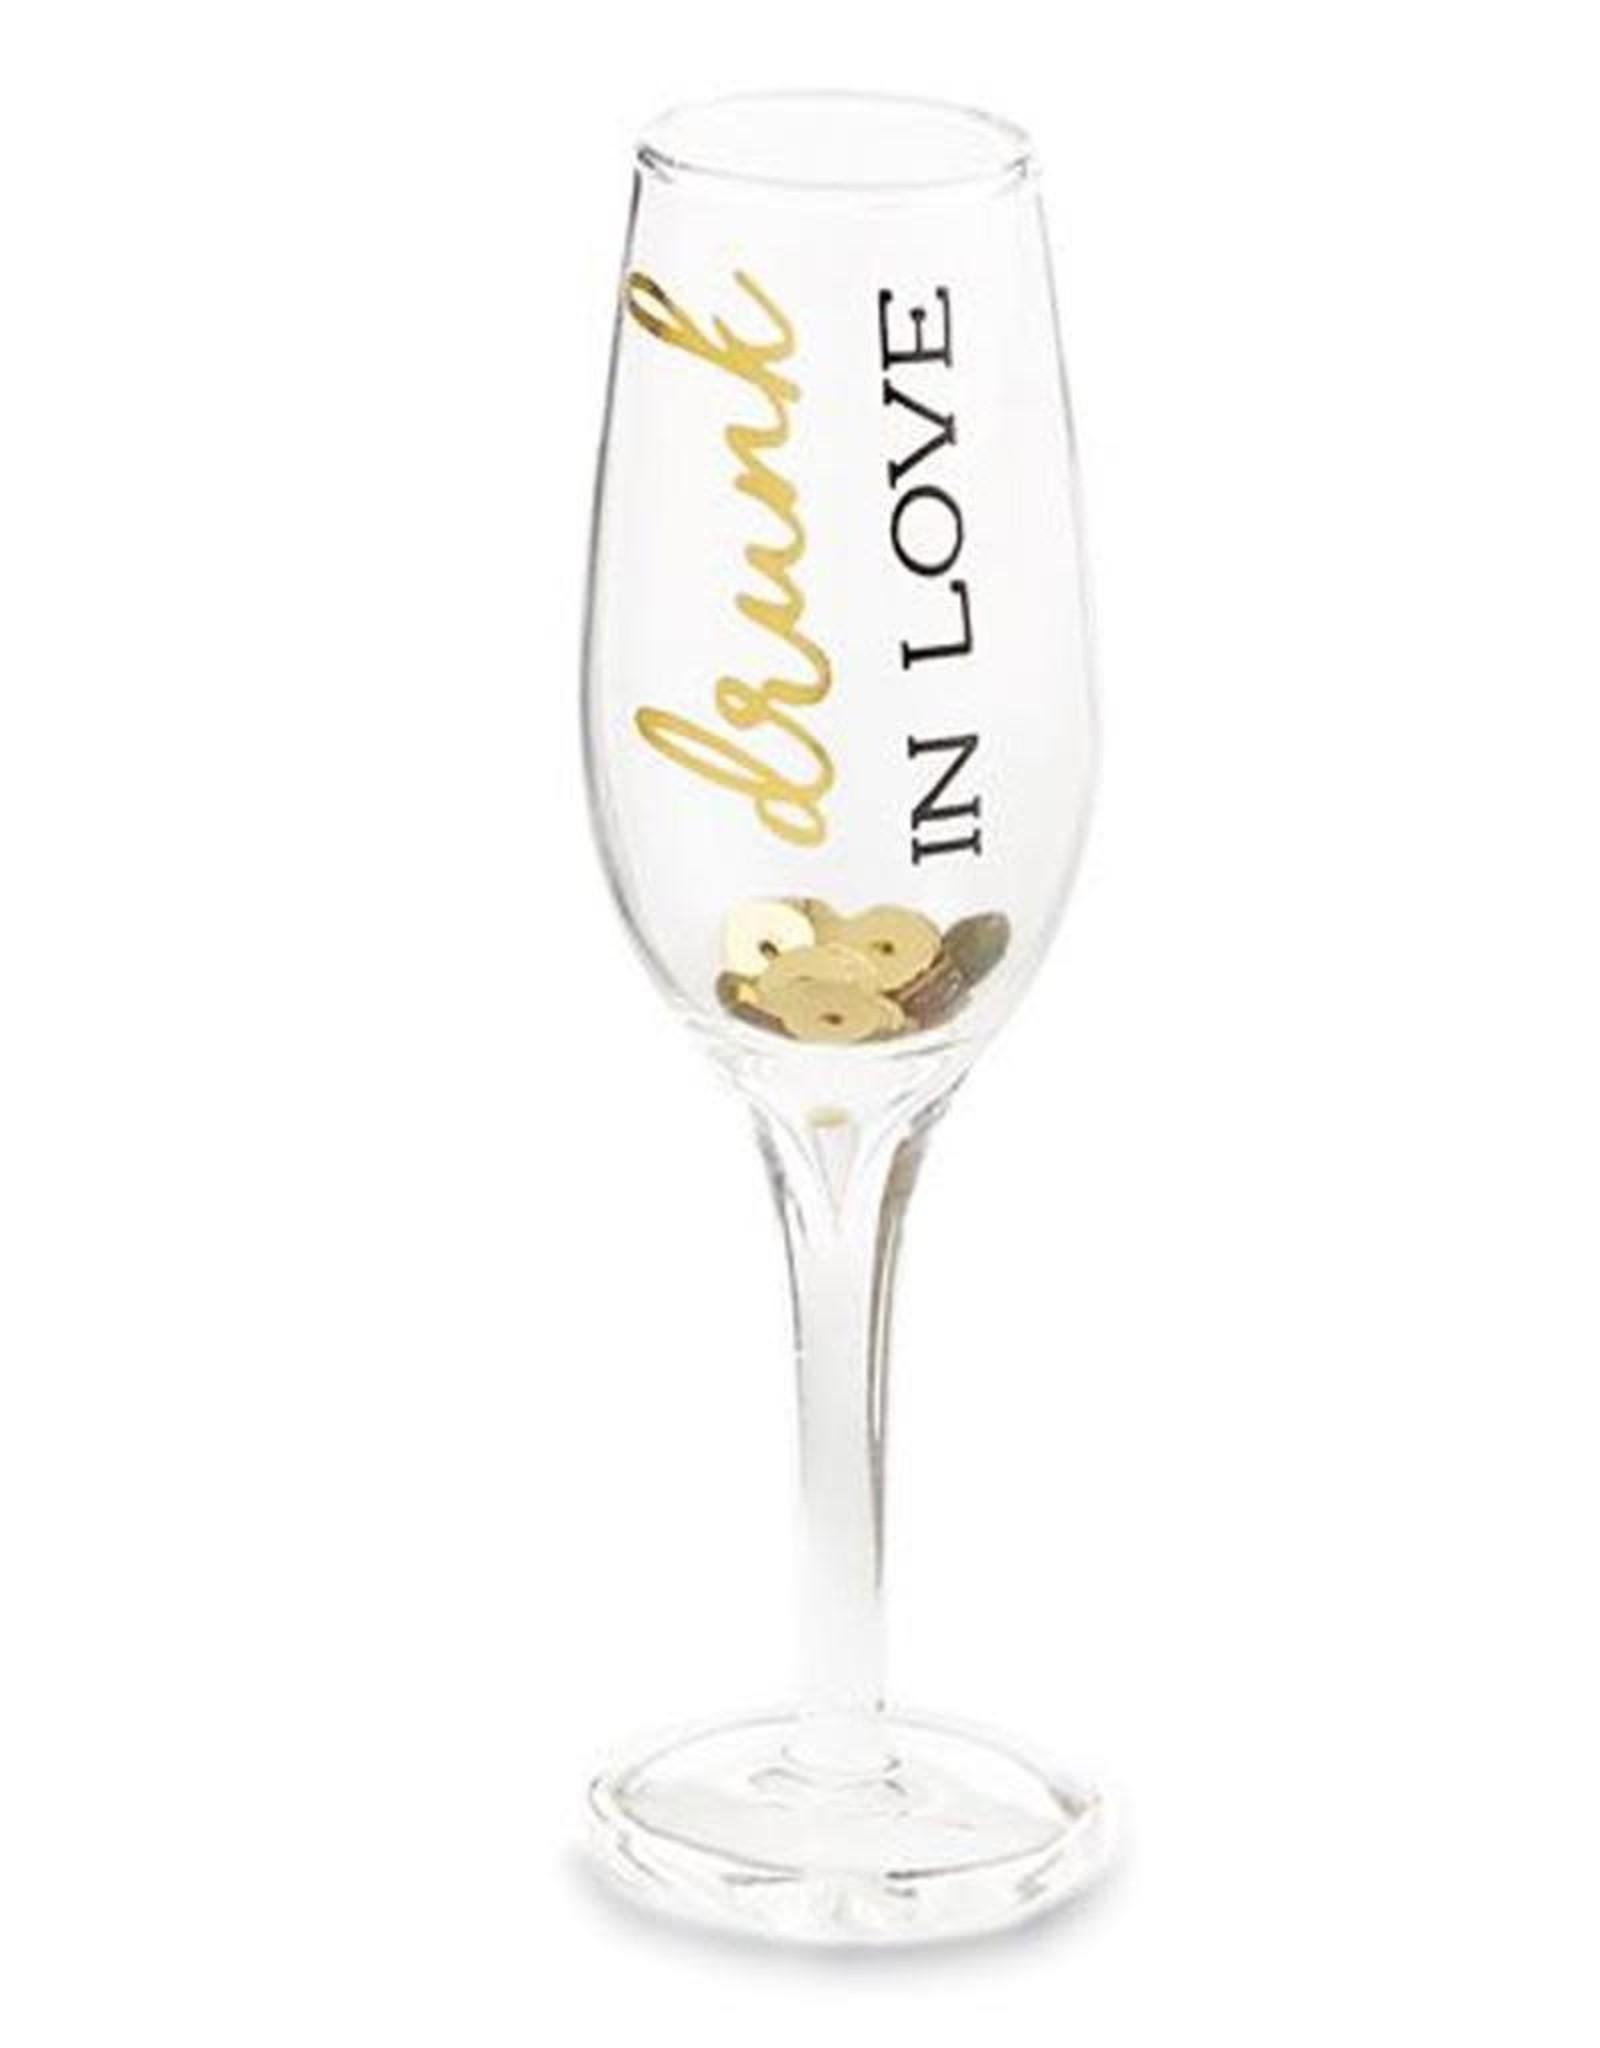 Mud Pie Bridal Party Mini Champagne Flute Shot Glass 1 oz Drunk In Love